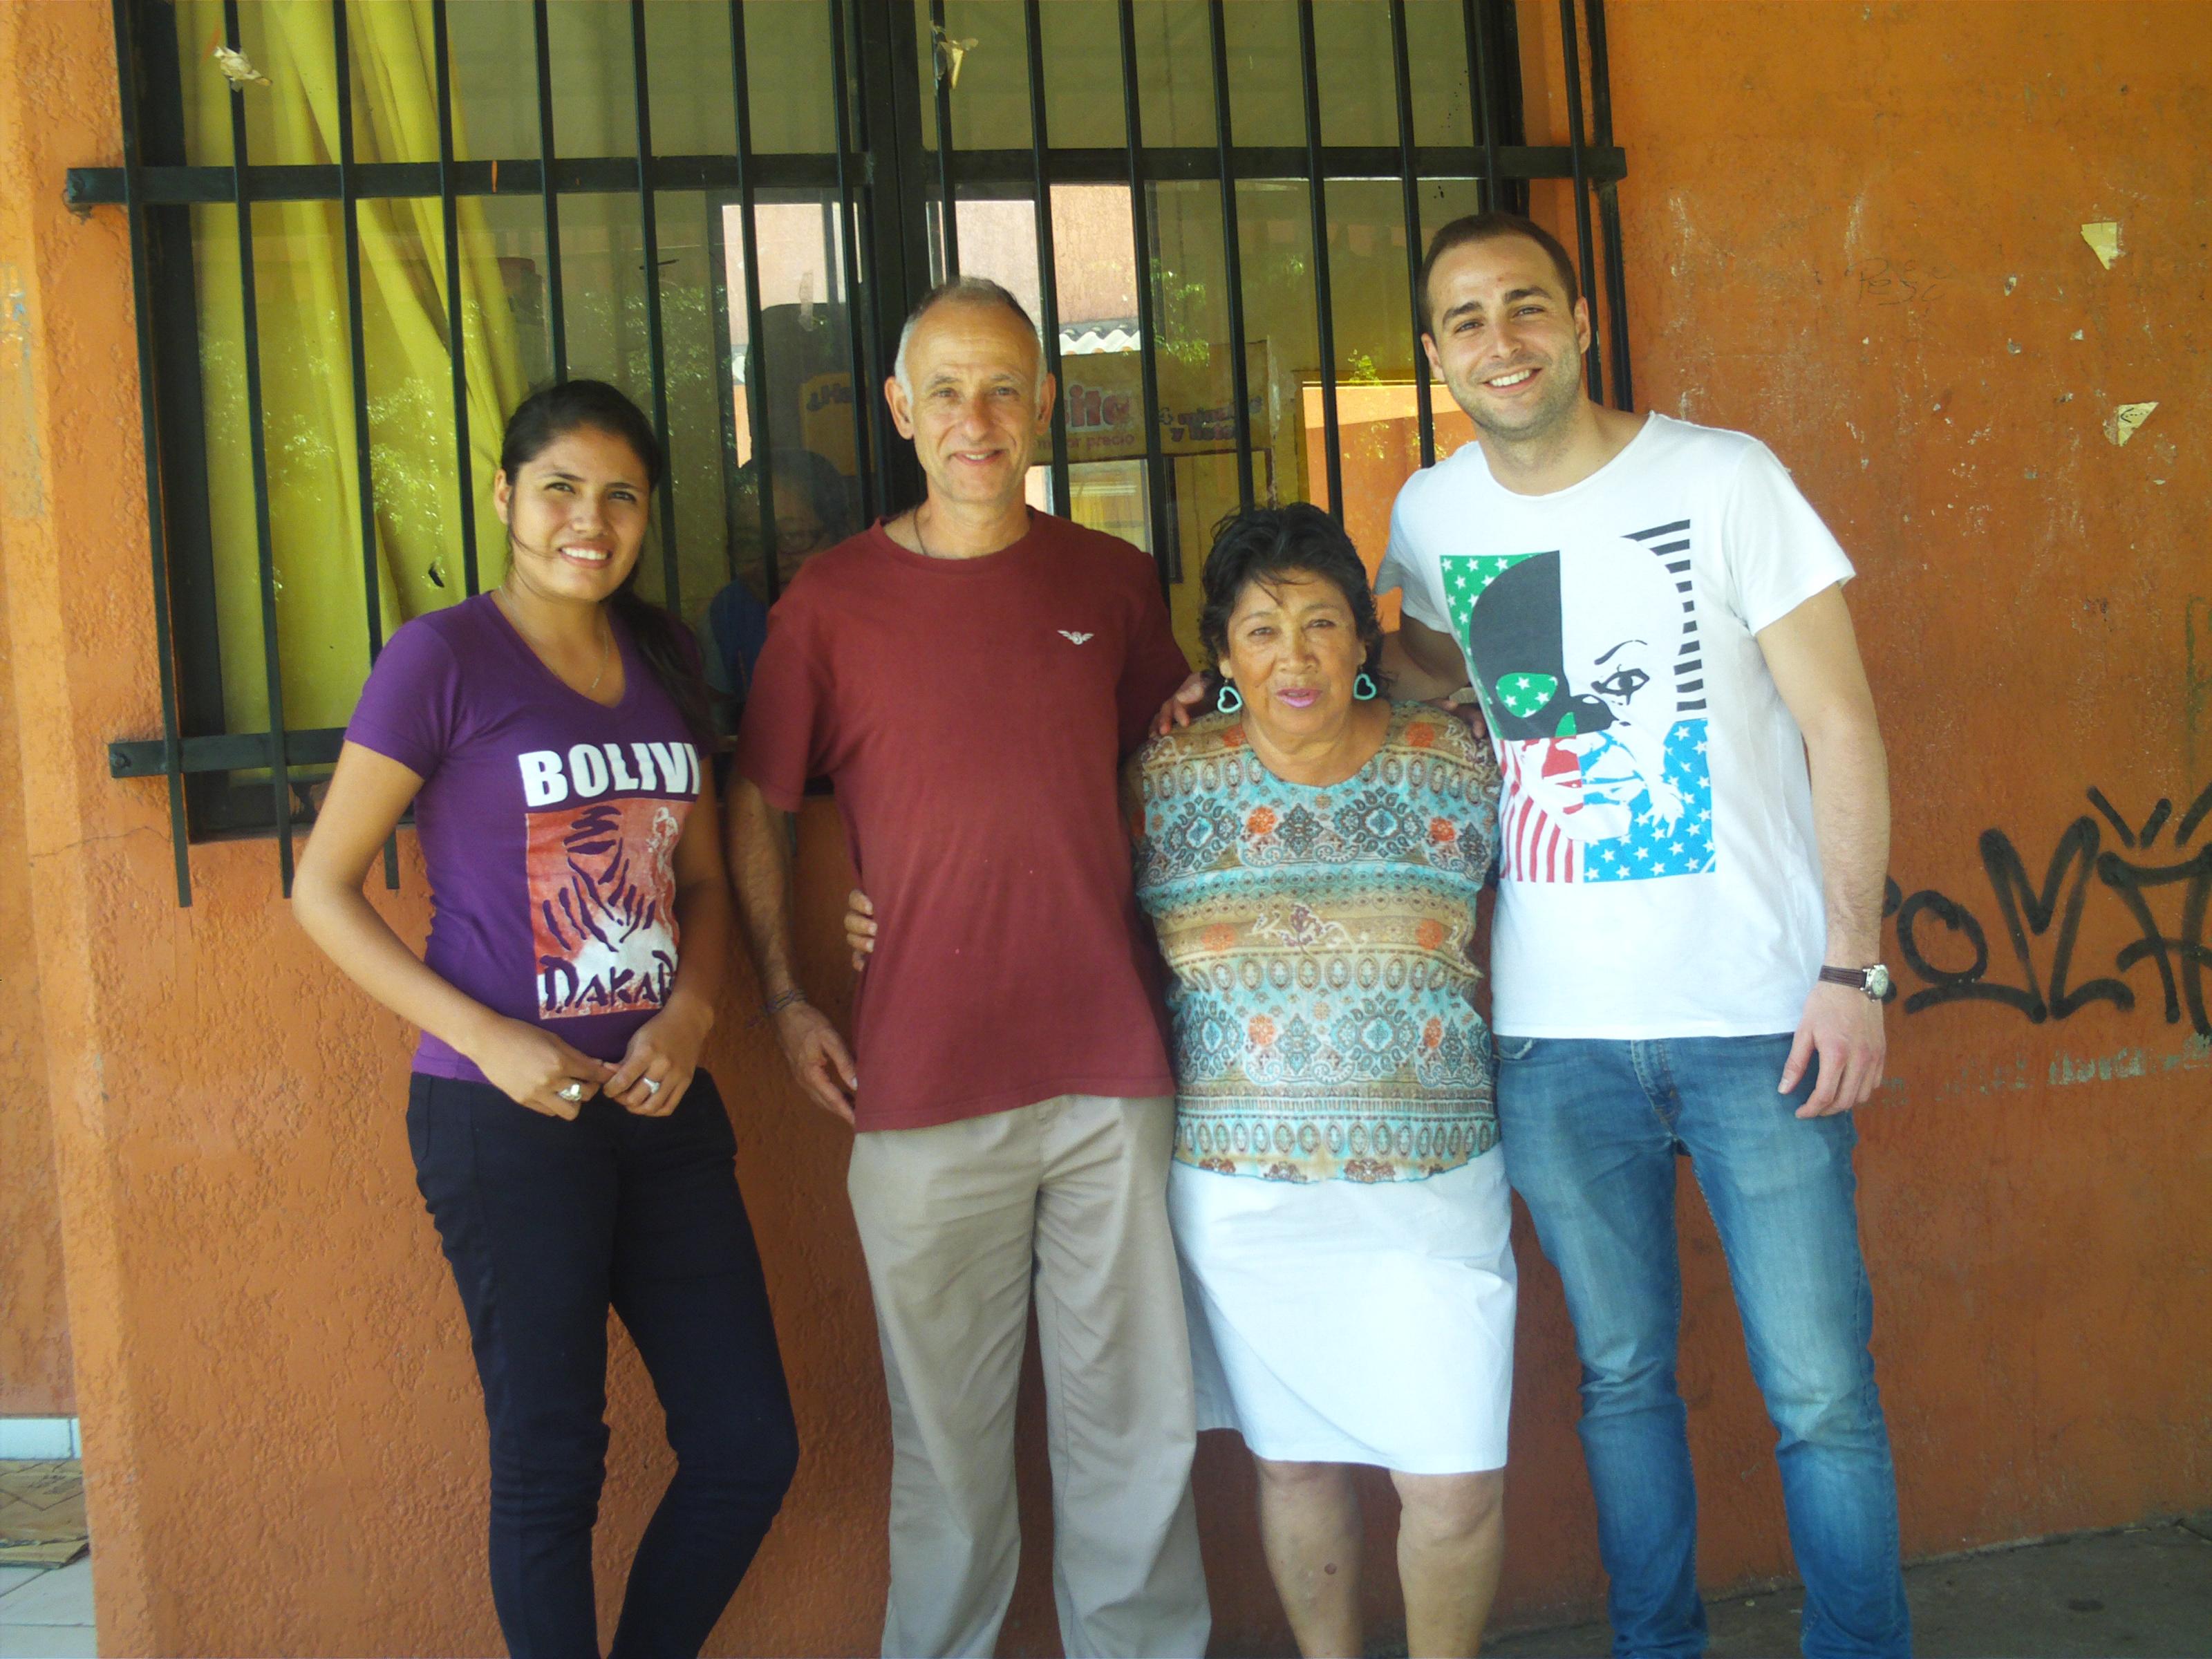 Mariana, Javier (responsable del